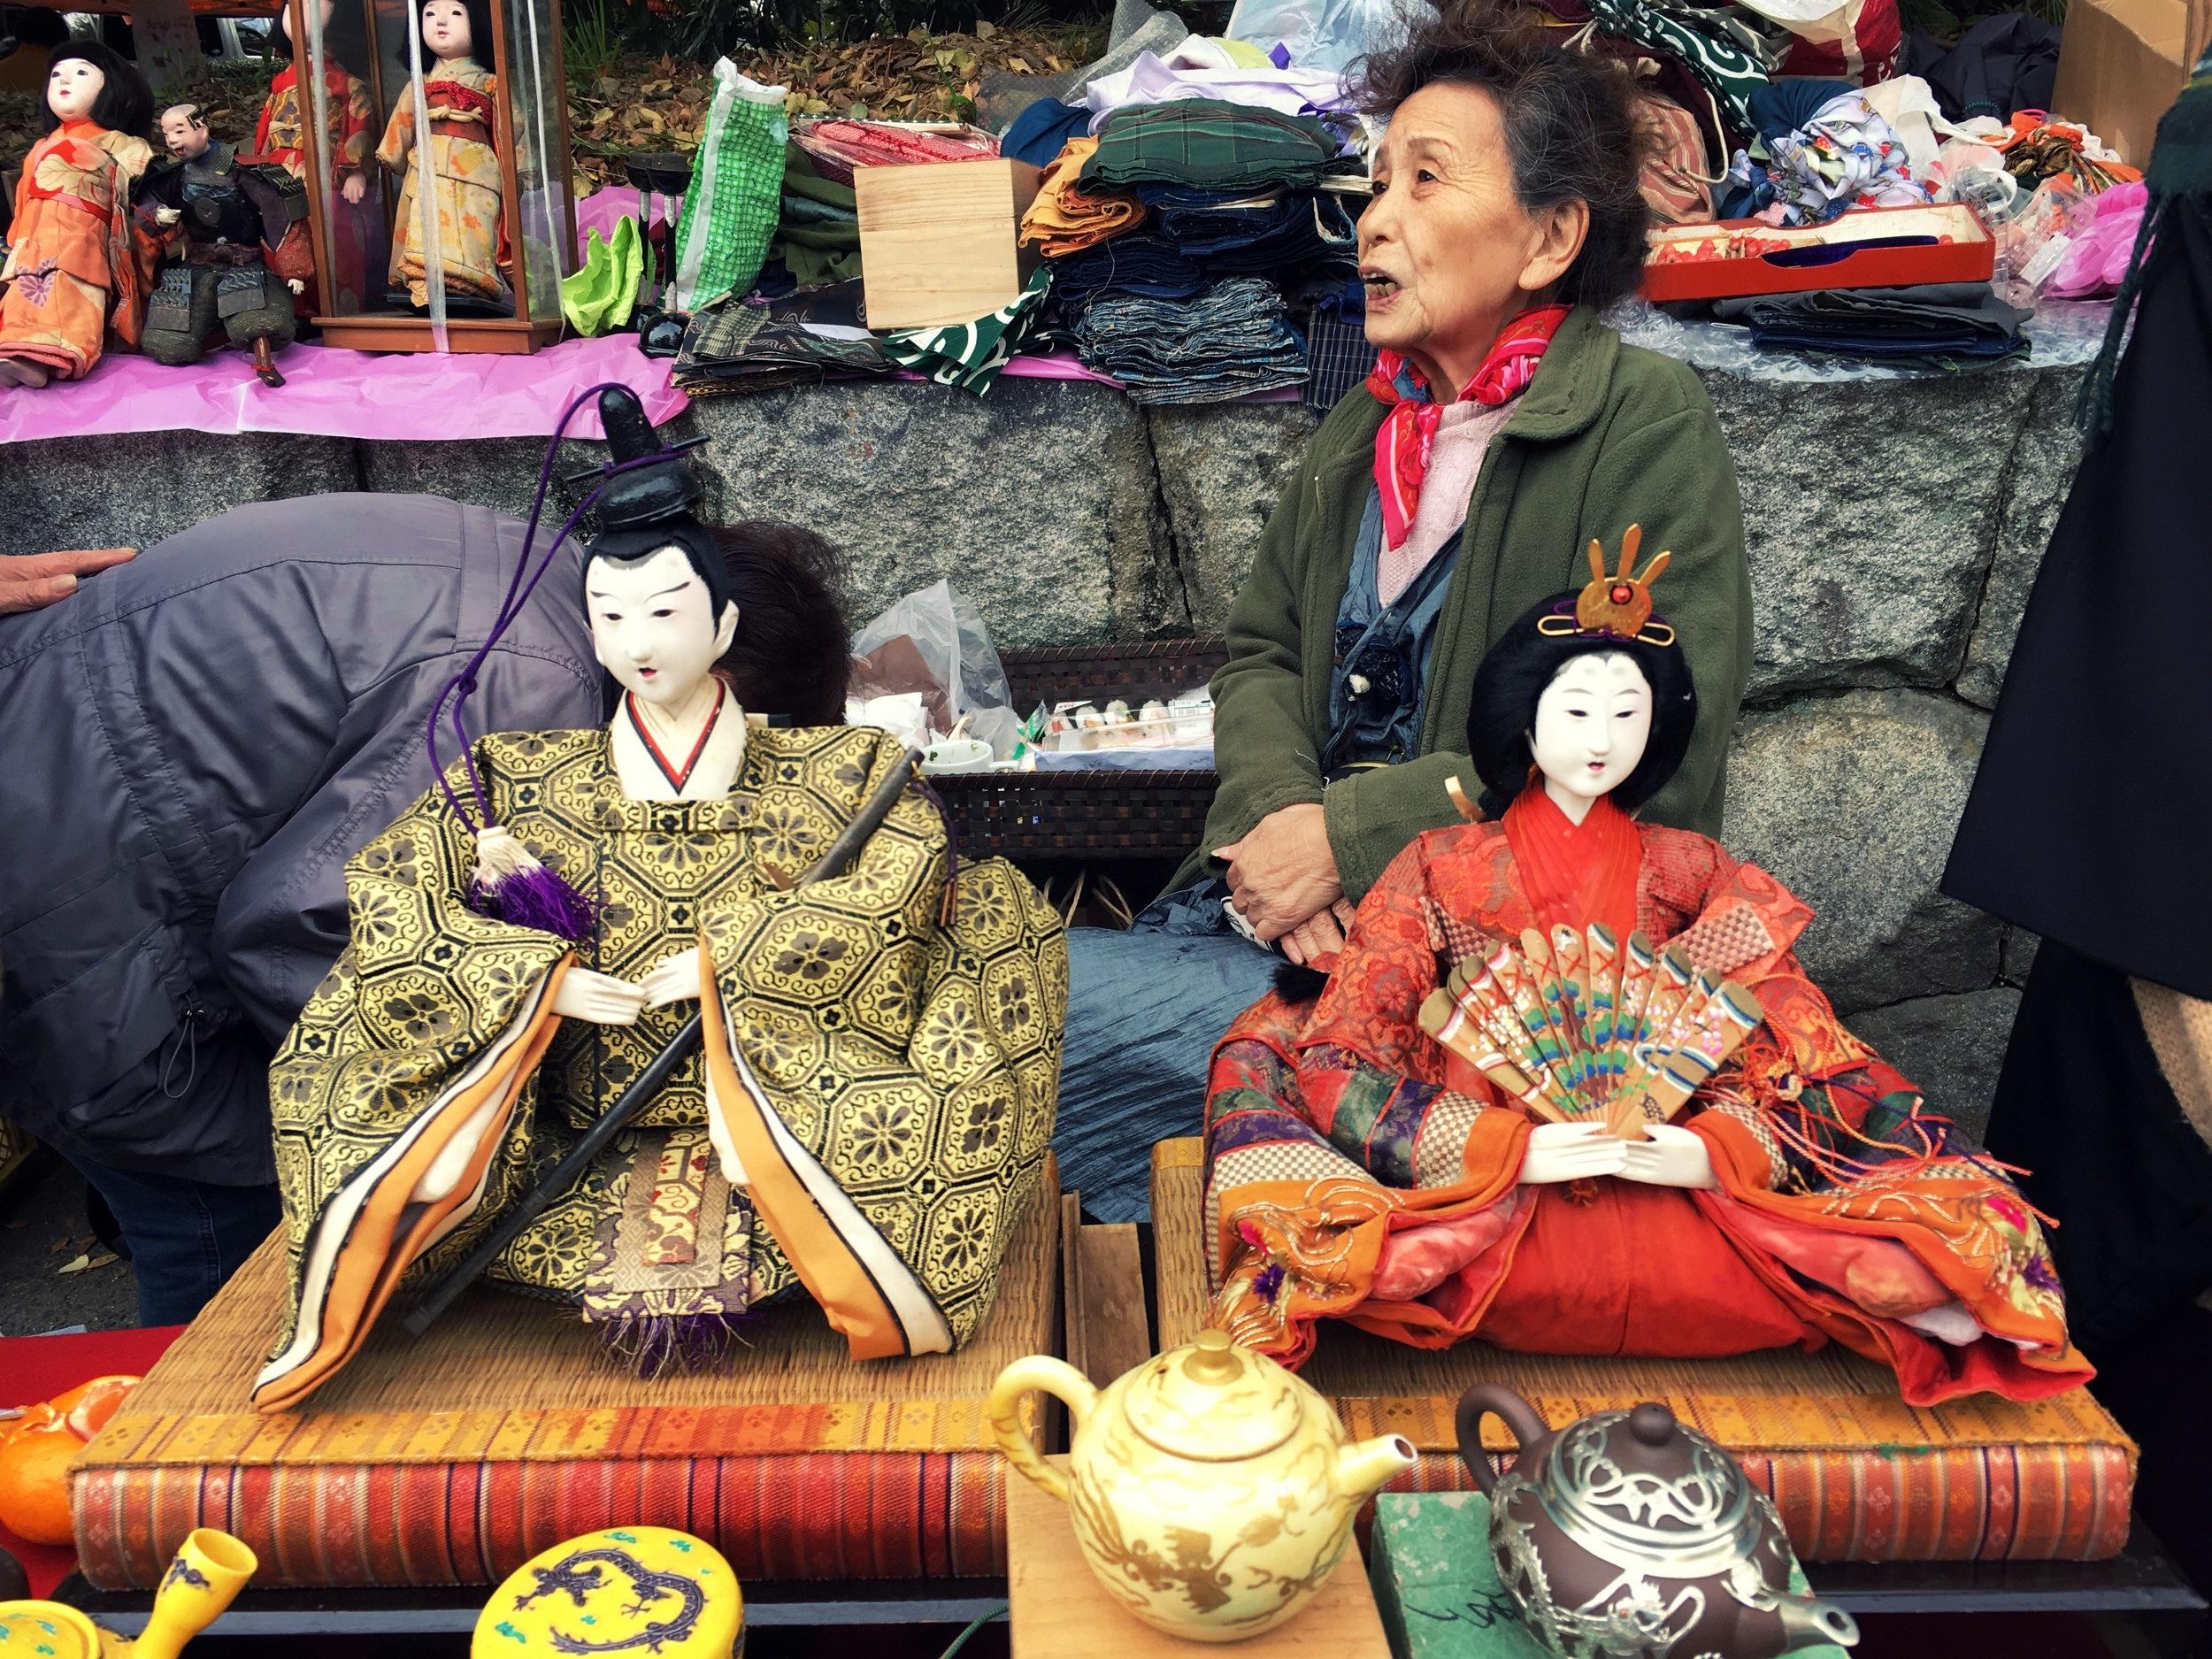 Suku puoli tarinoita Japani